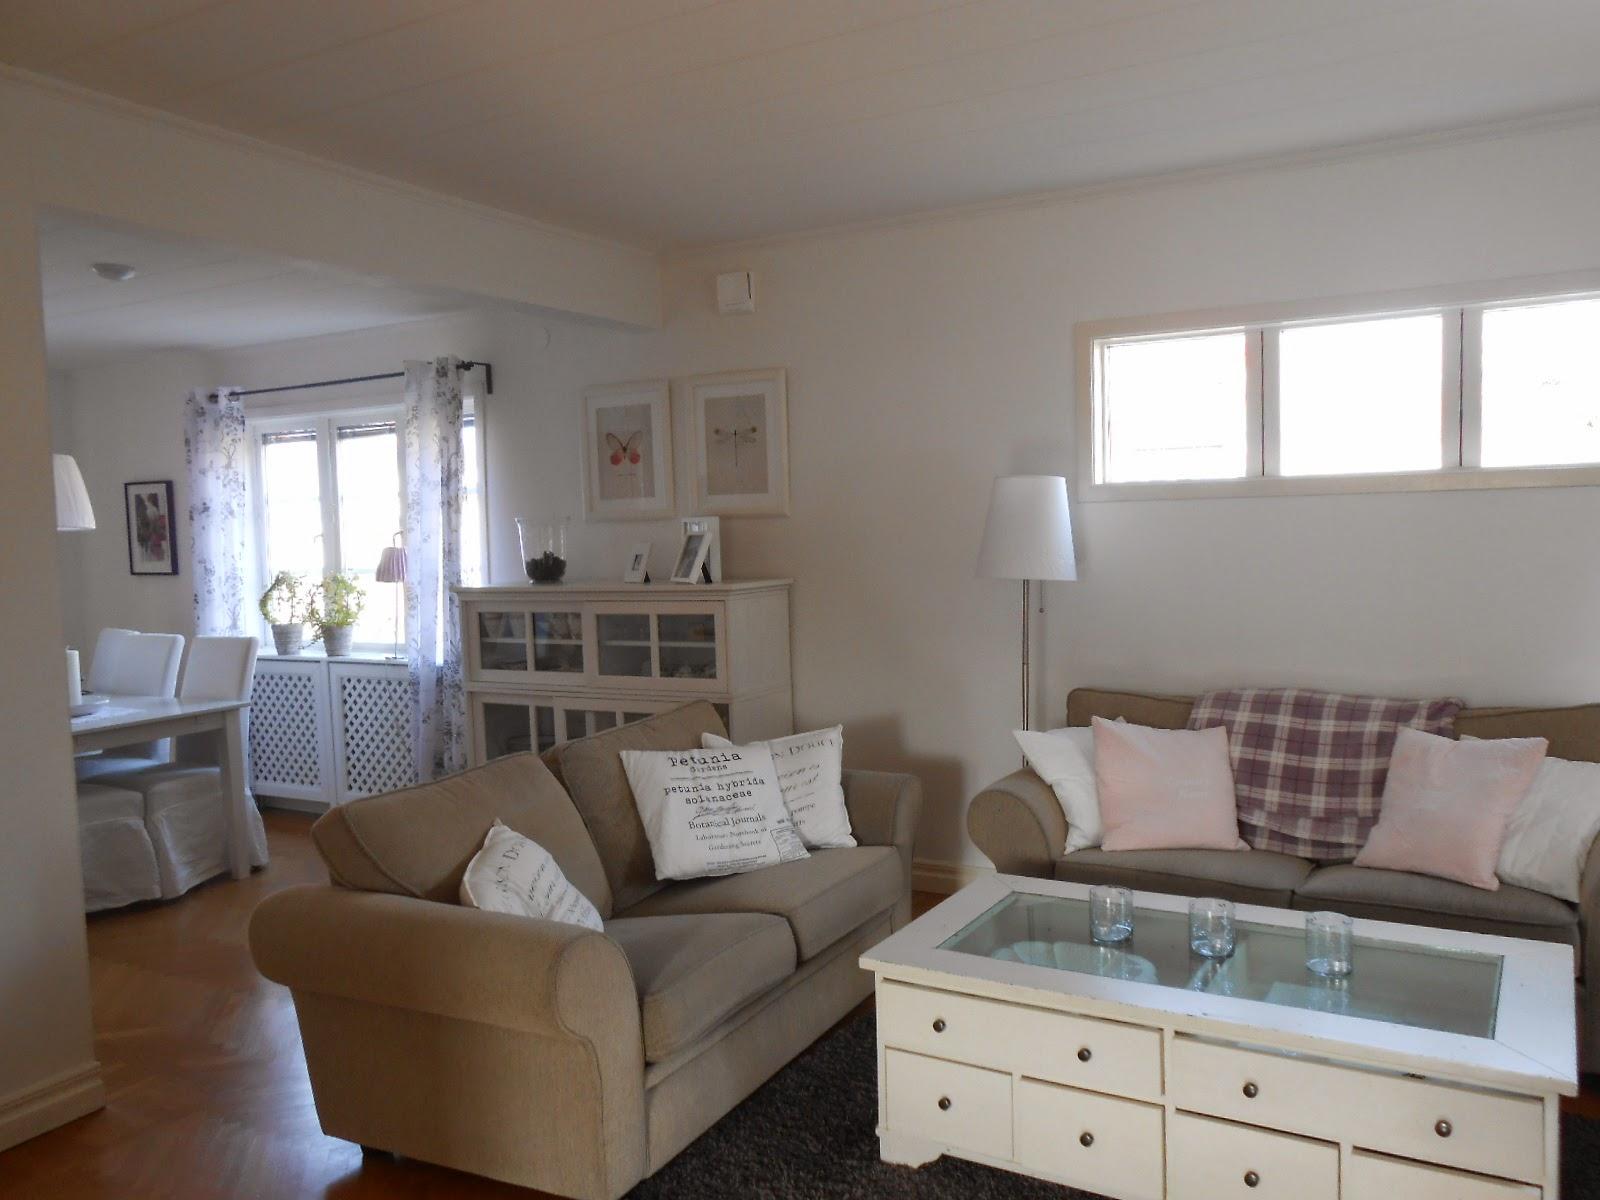 Det nya huset: april 2014